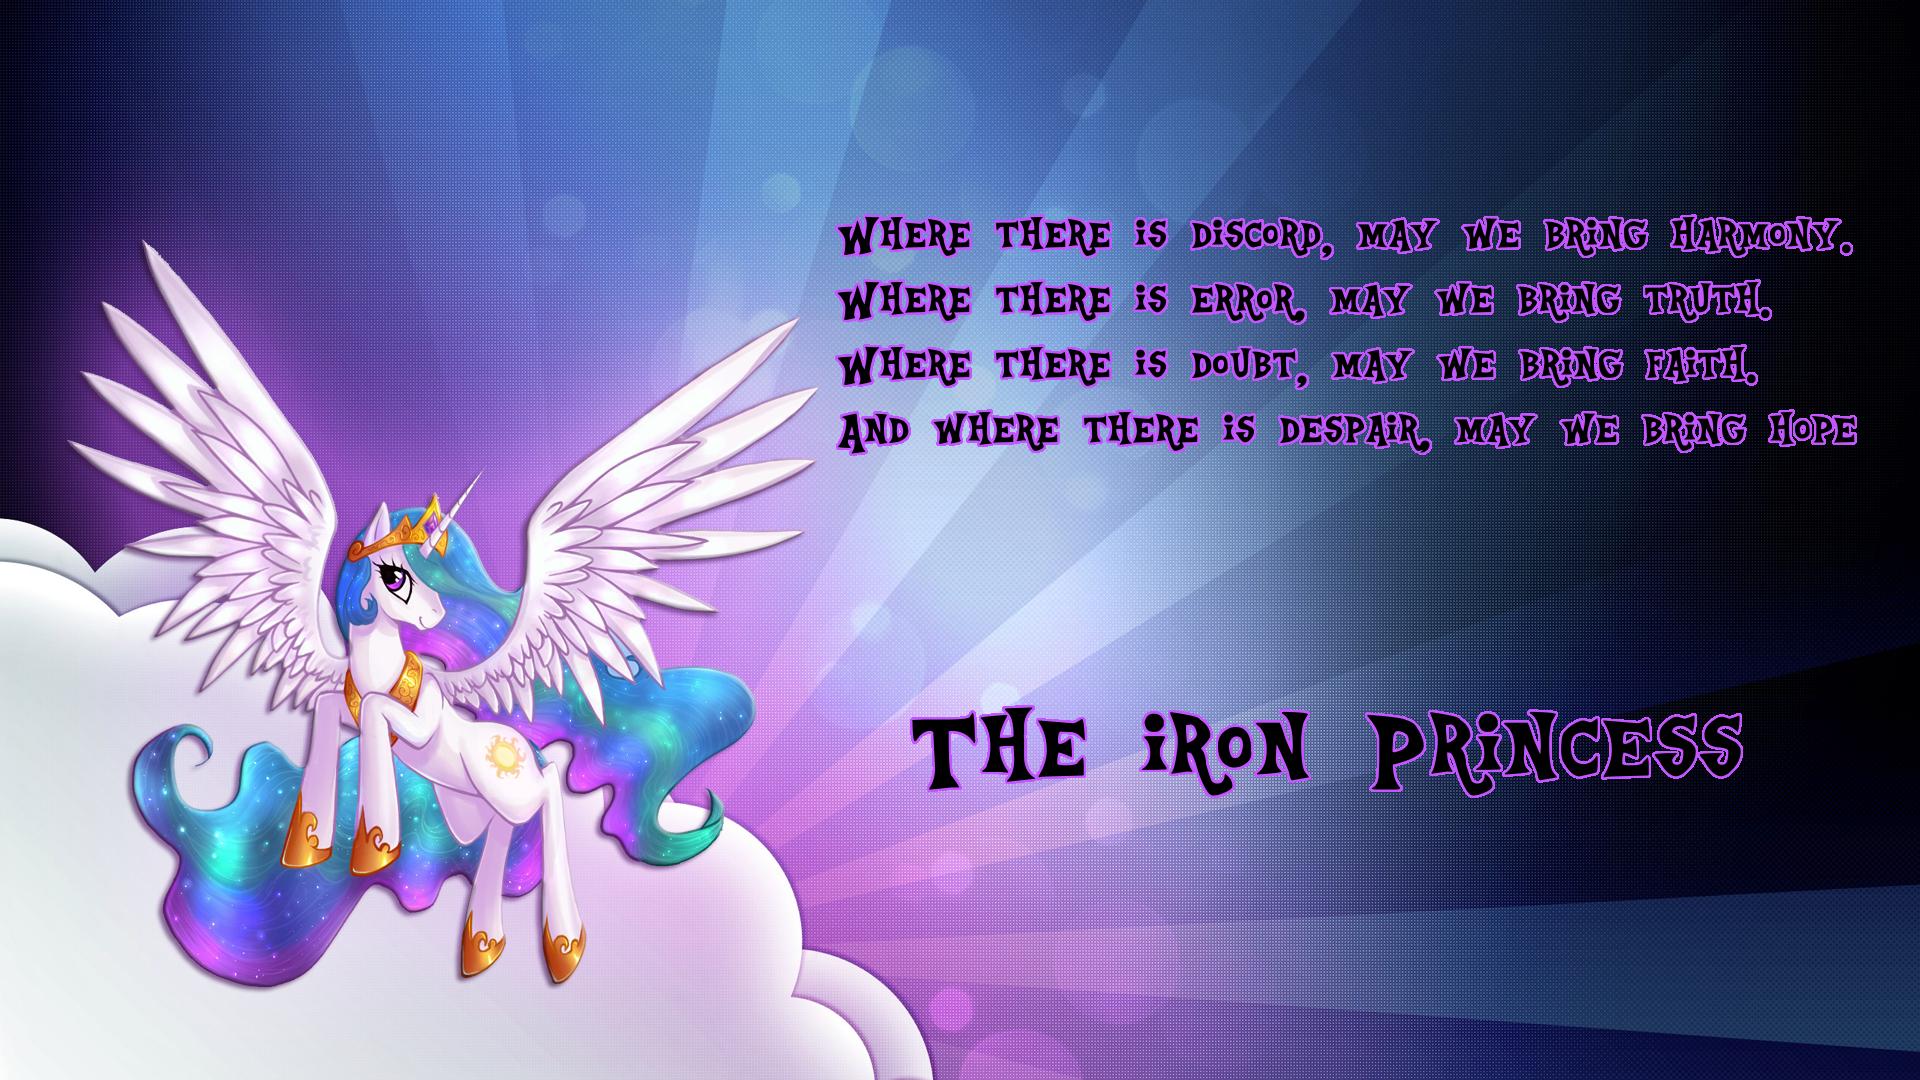 The Iron Princess. In memory of the Iron Princess.